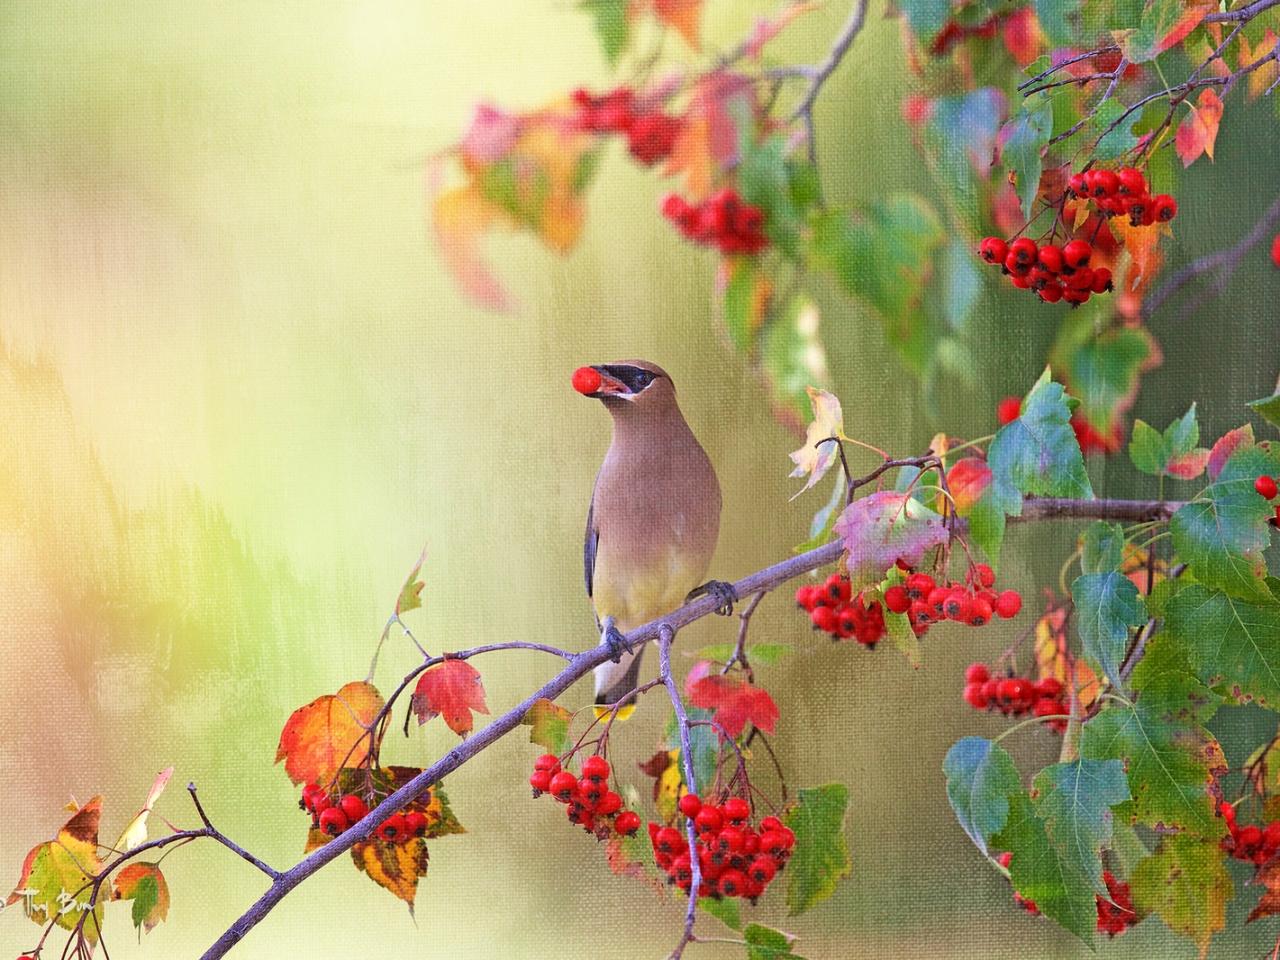 Dibujo pintado de aves - 1280x960